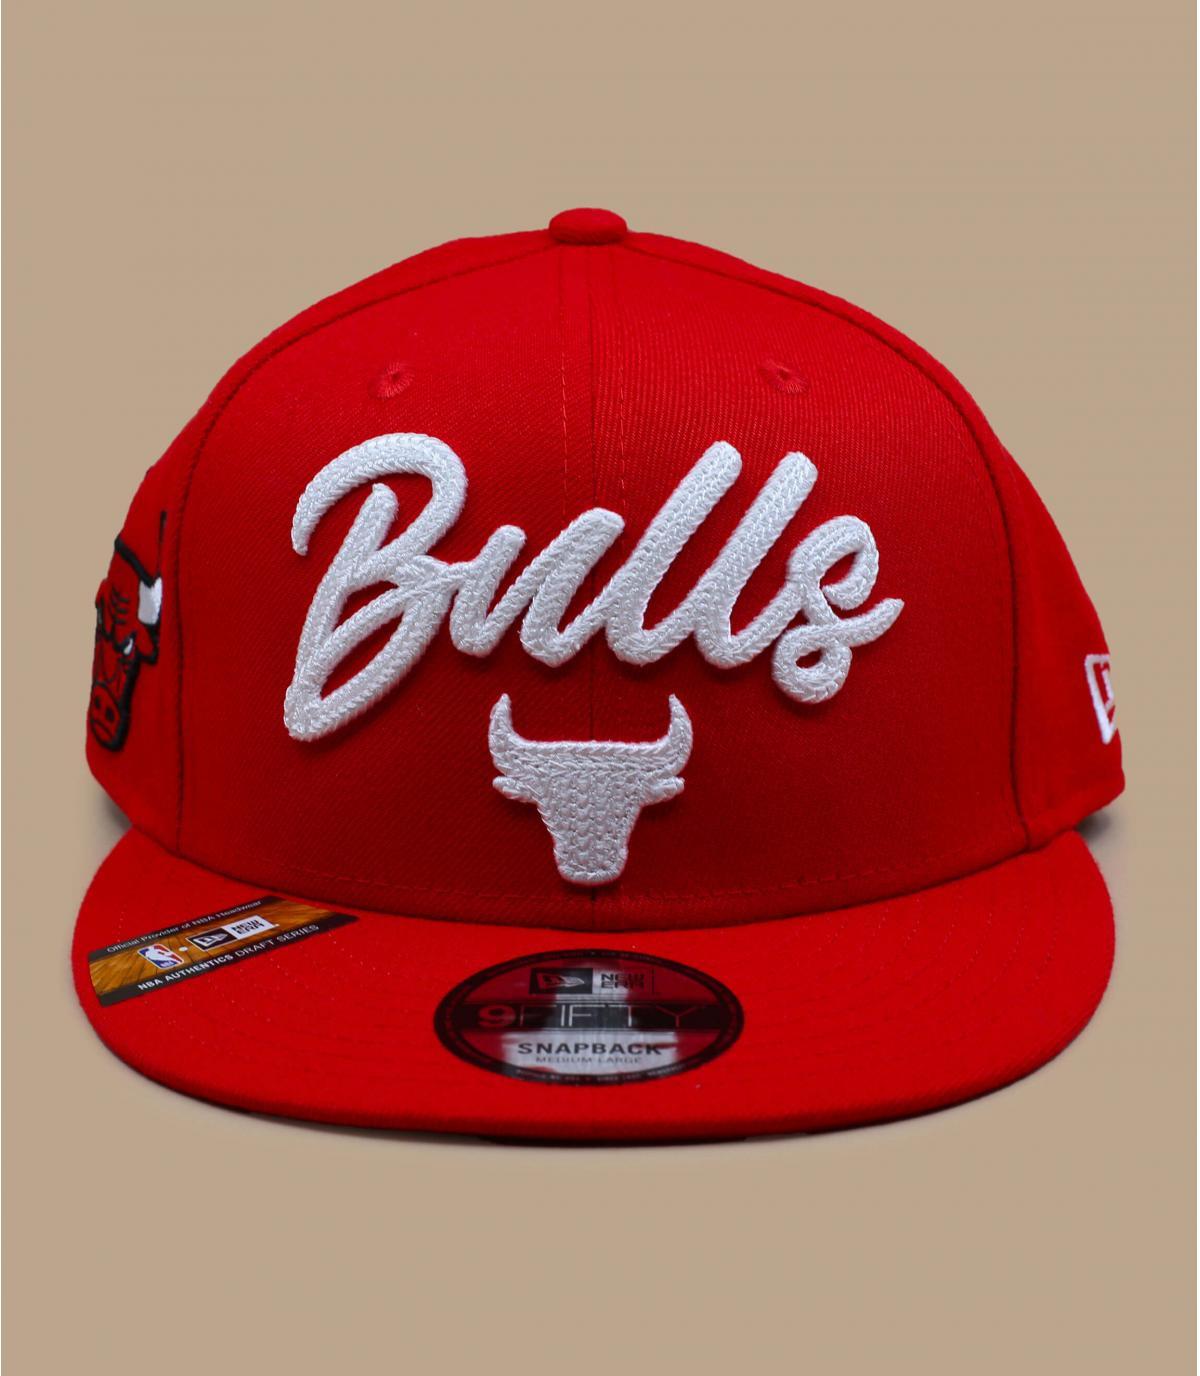 rode stieren cap